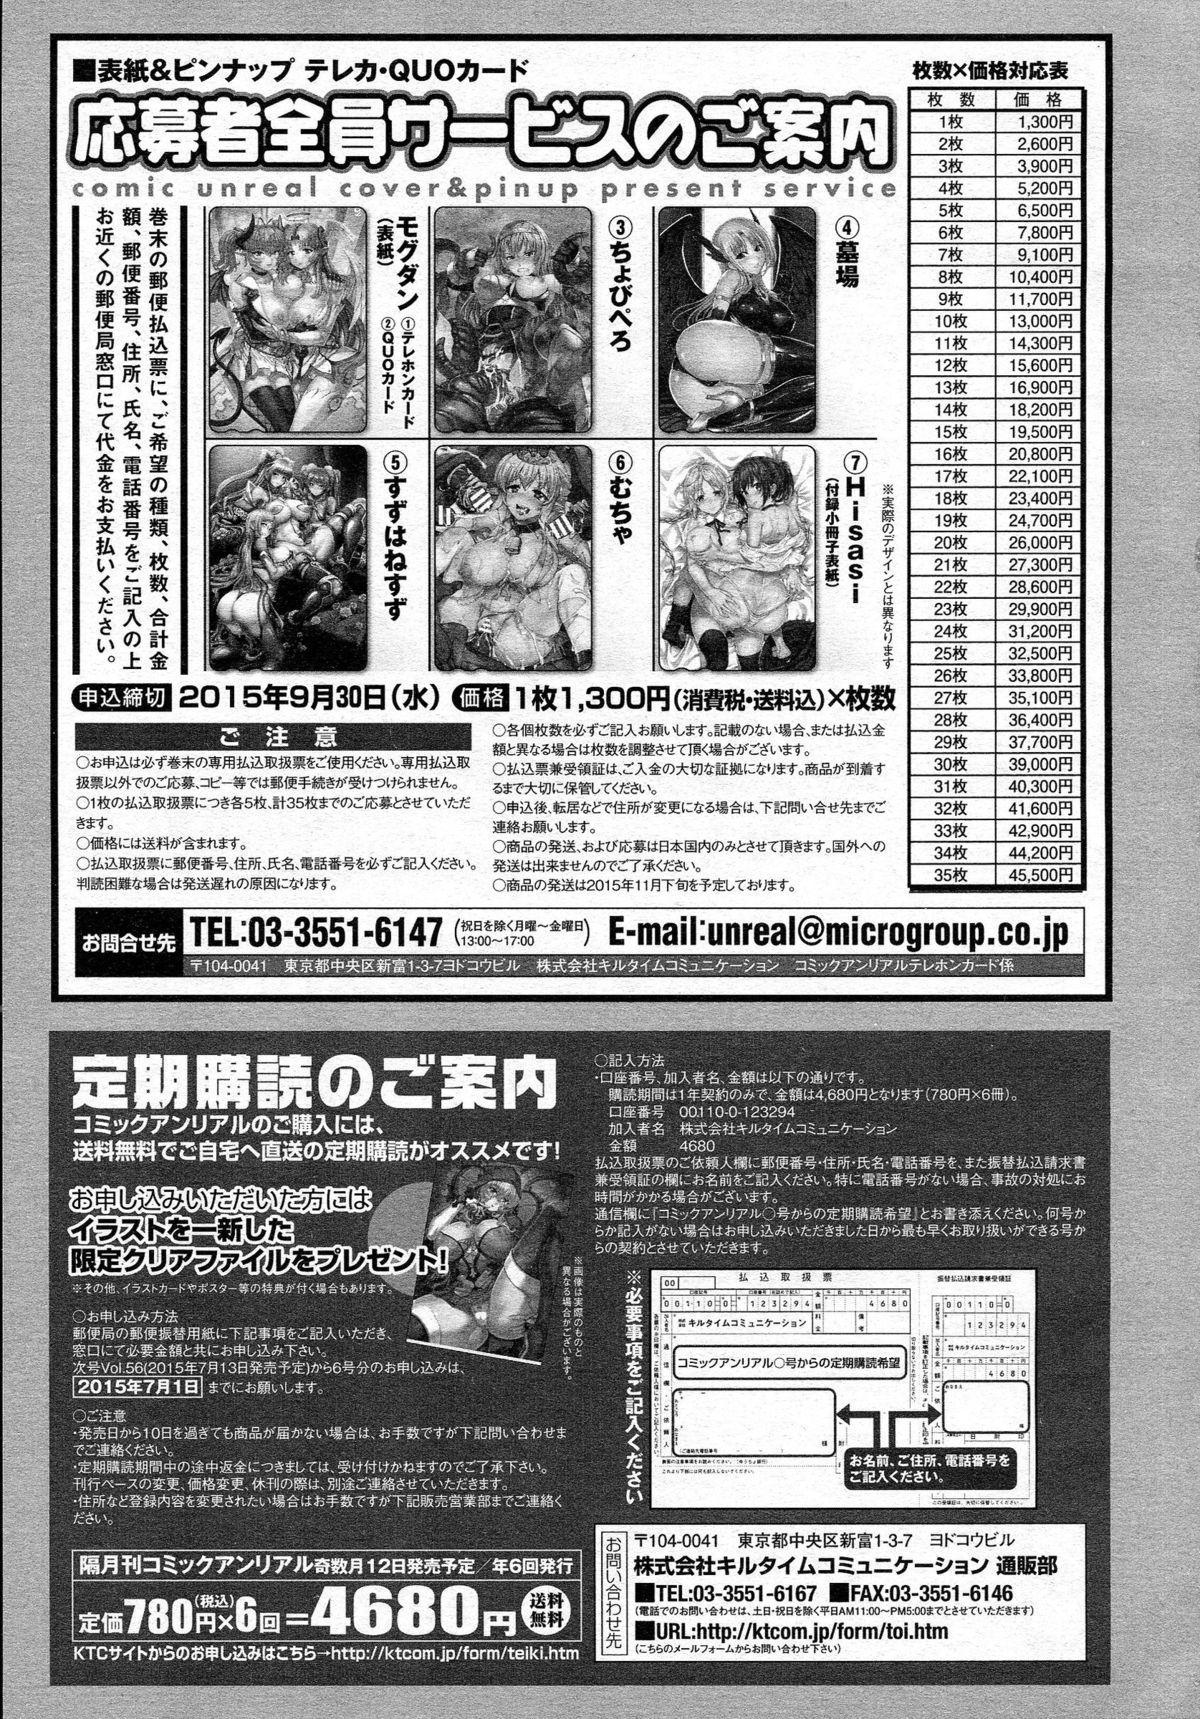 COMIC Unreal 2015-06 Vol. 55 + Hisasi Illust Shuu 452